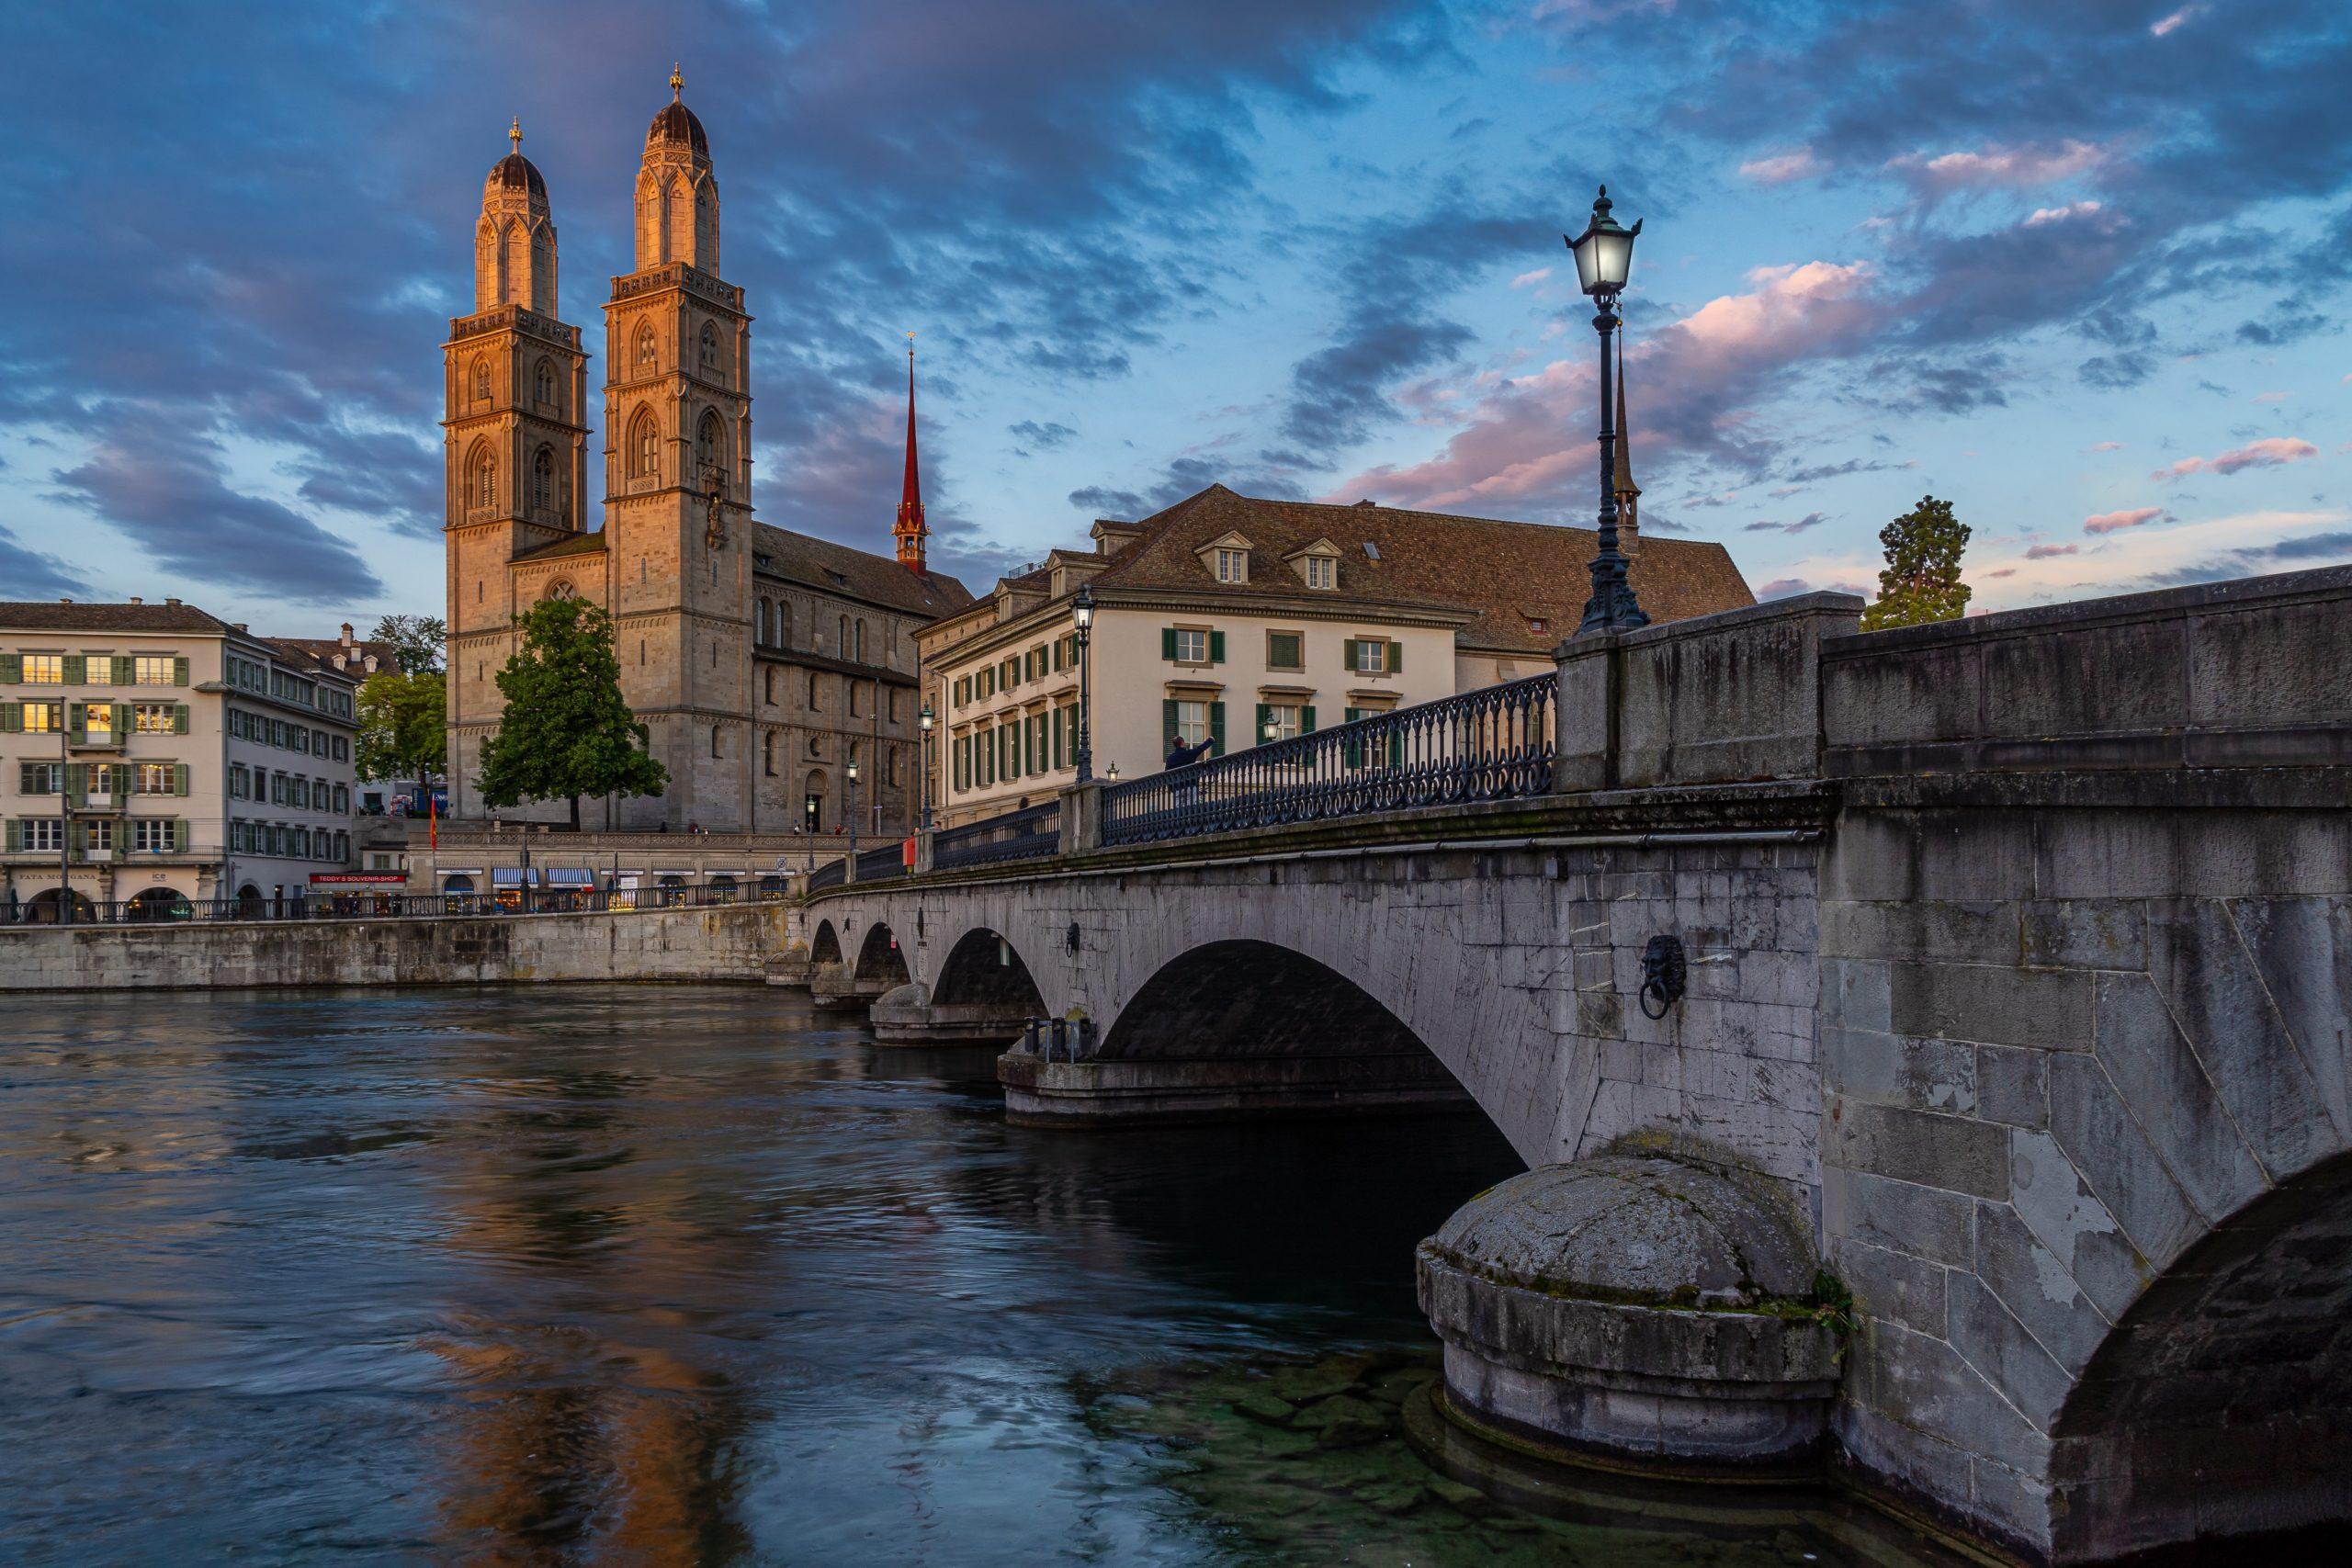 Russian: Базирующаяся в Цюрихе компания Swiss Fund Platform AG запускает платформу SWIC-Gateway